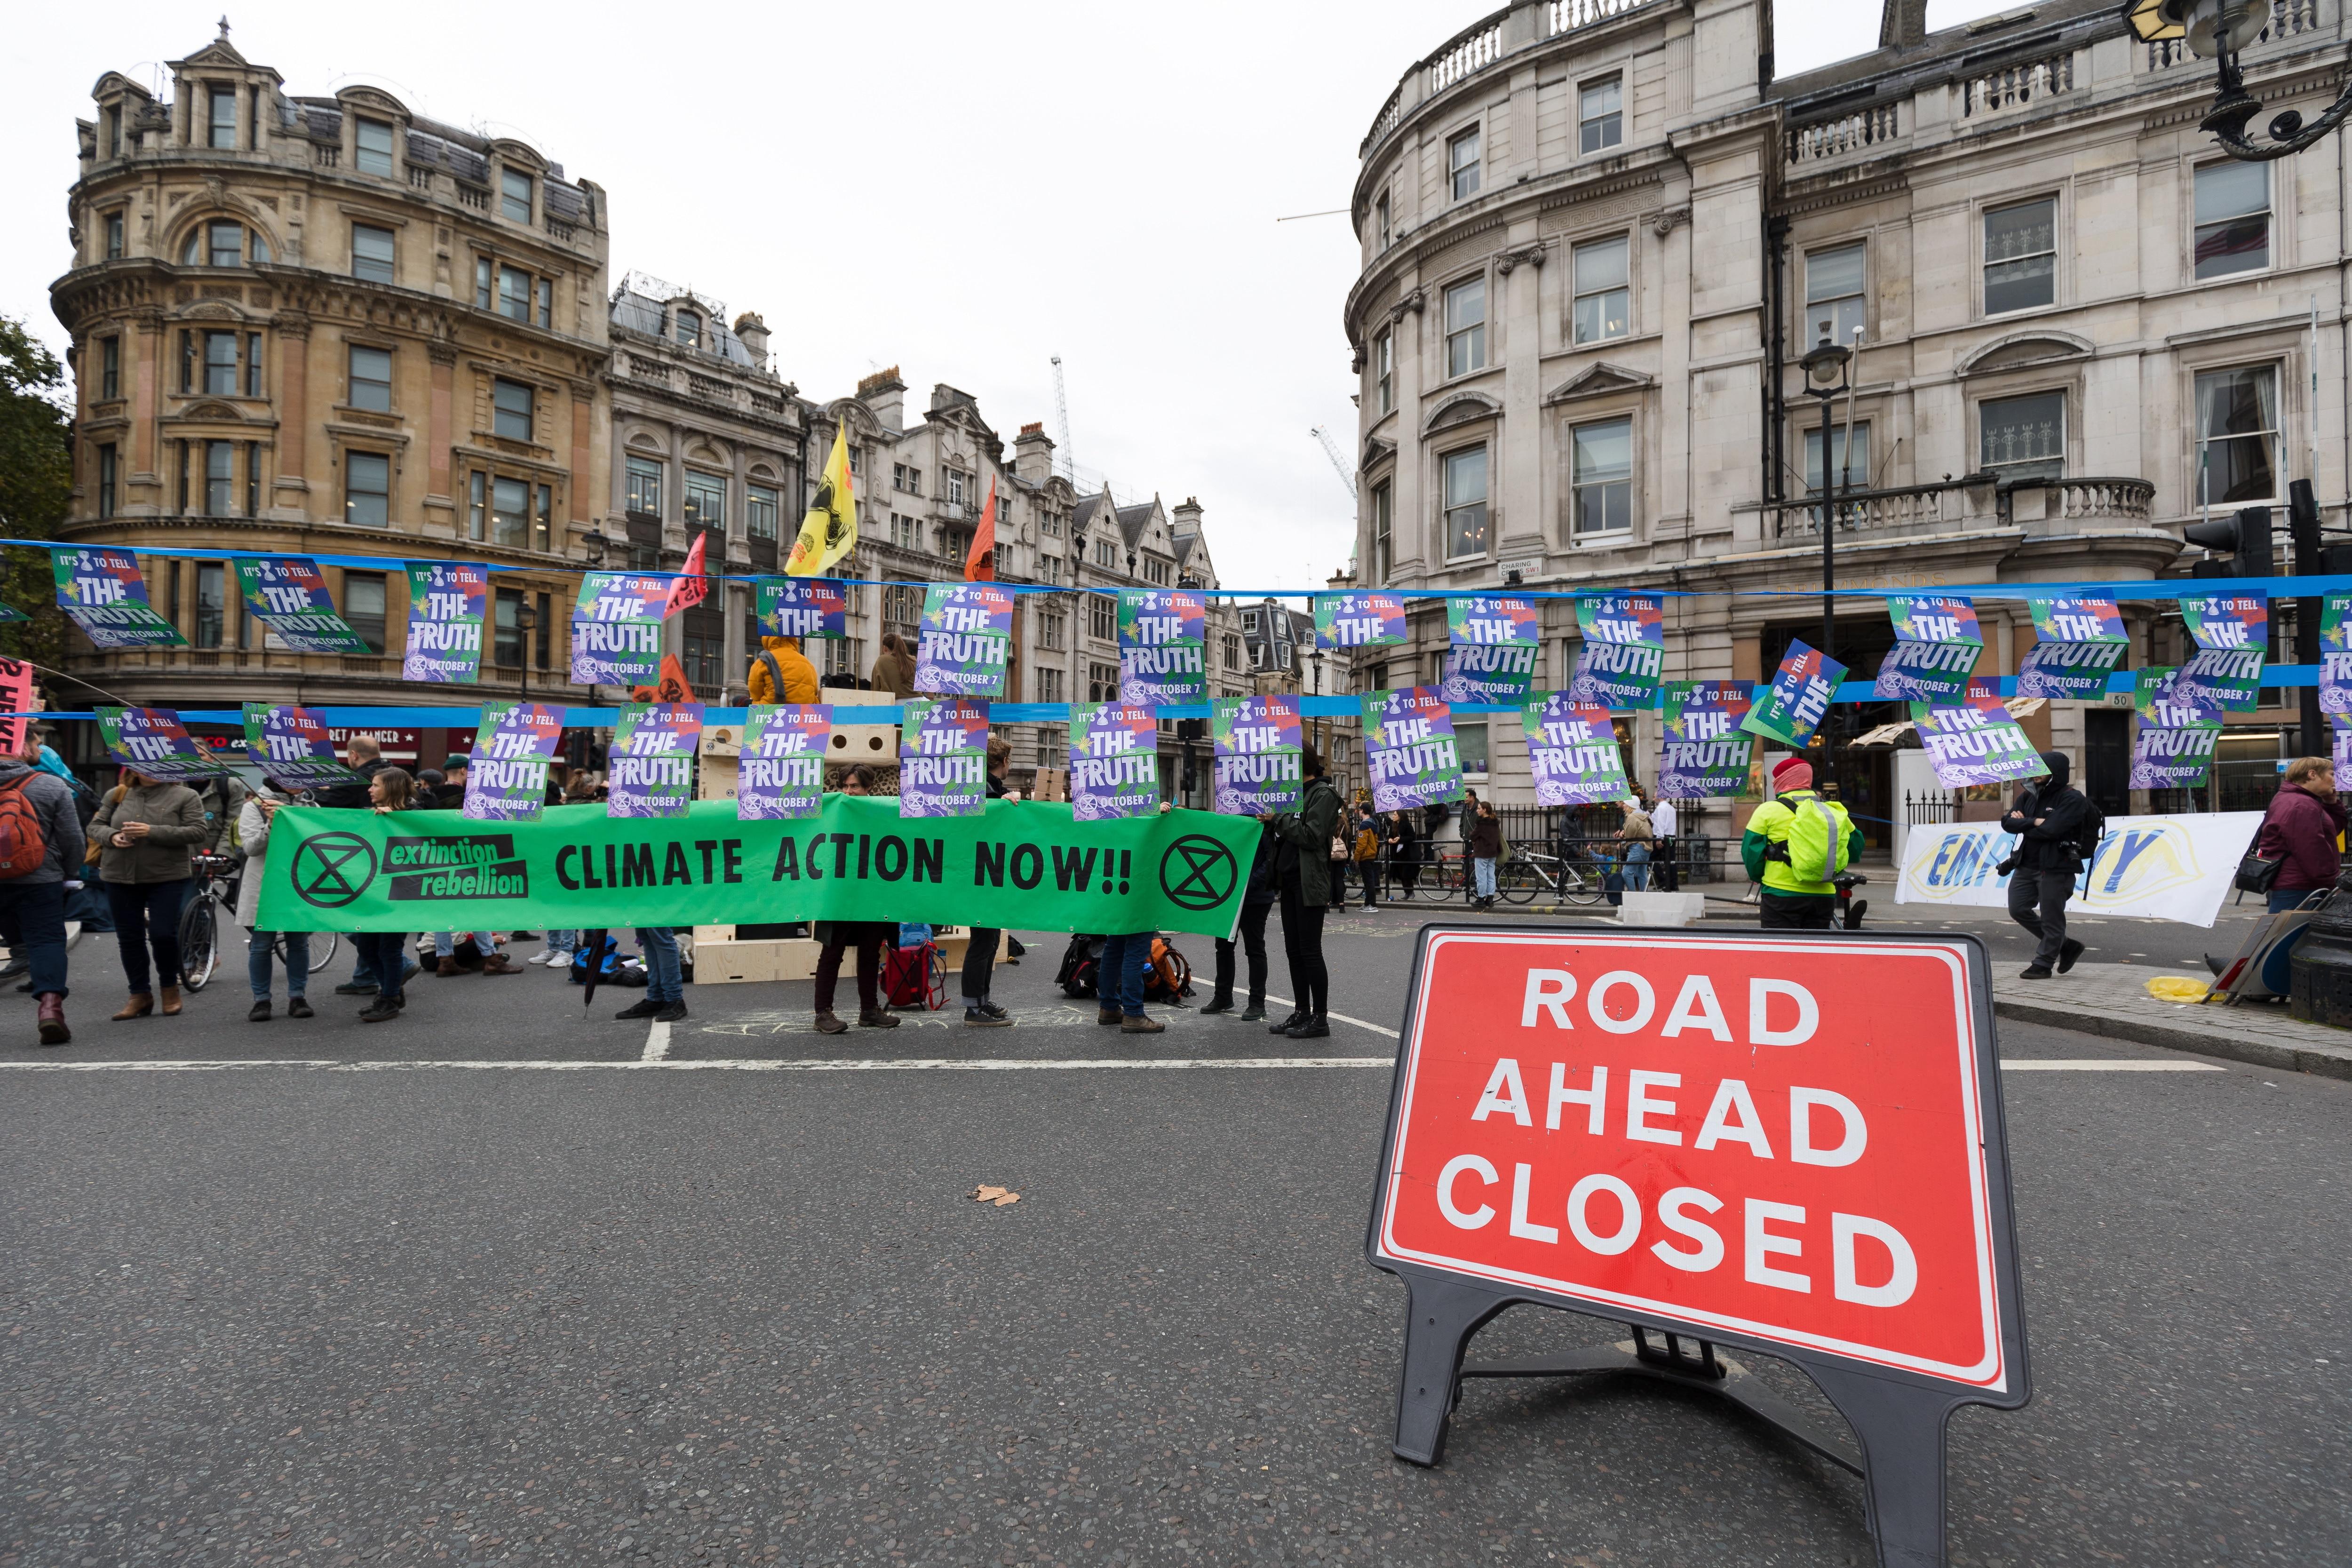 Extinction Rebellion protesters block the road in Trafalgar Square in London.